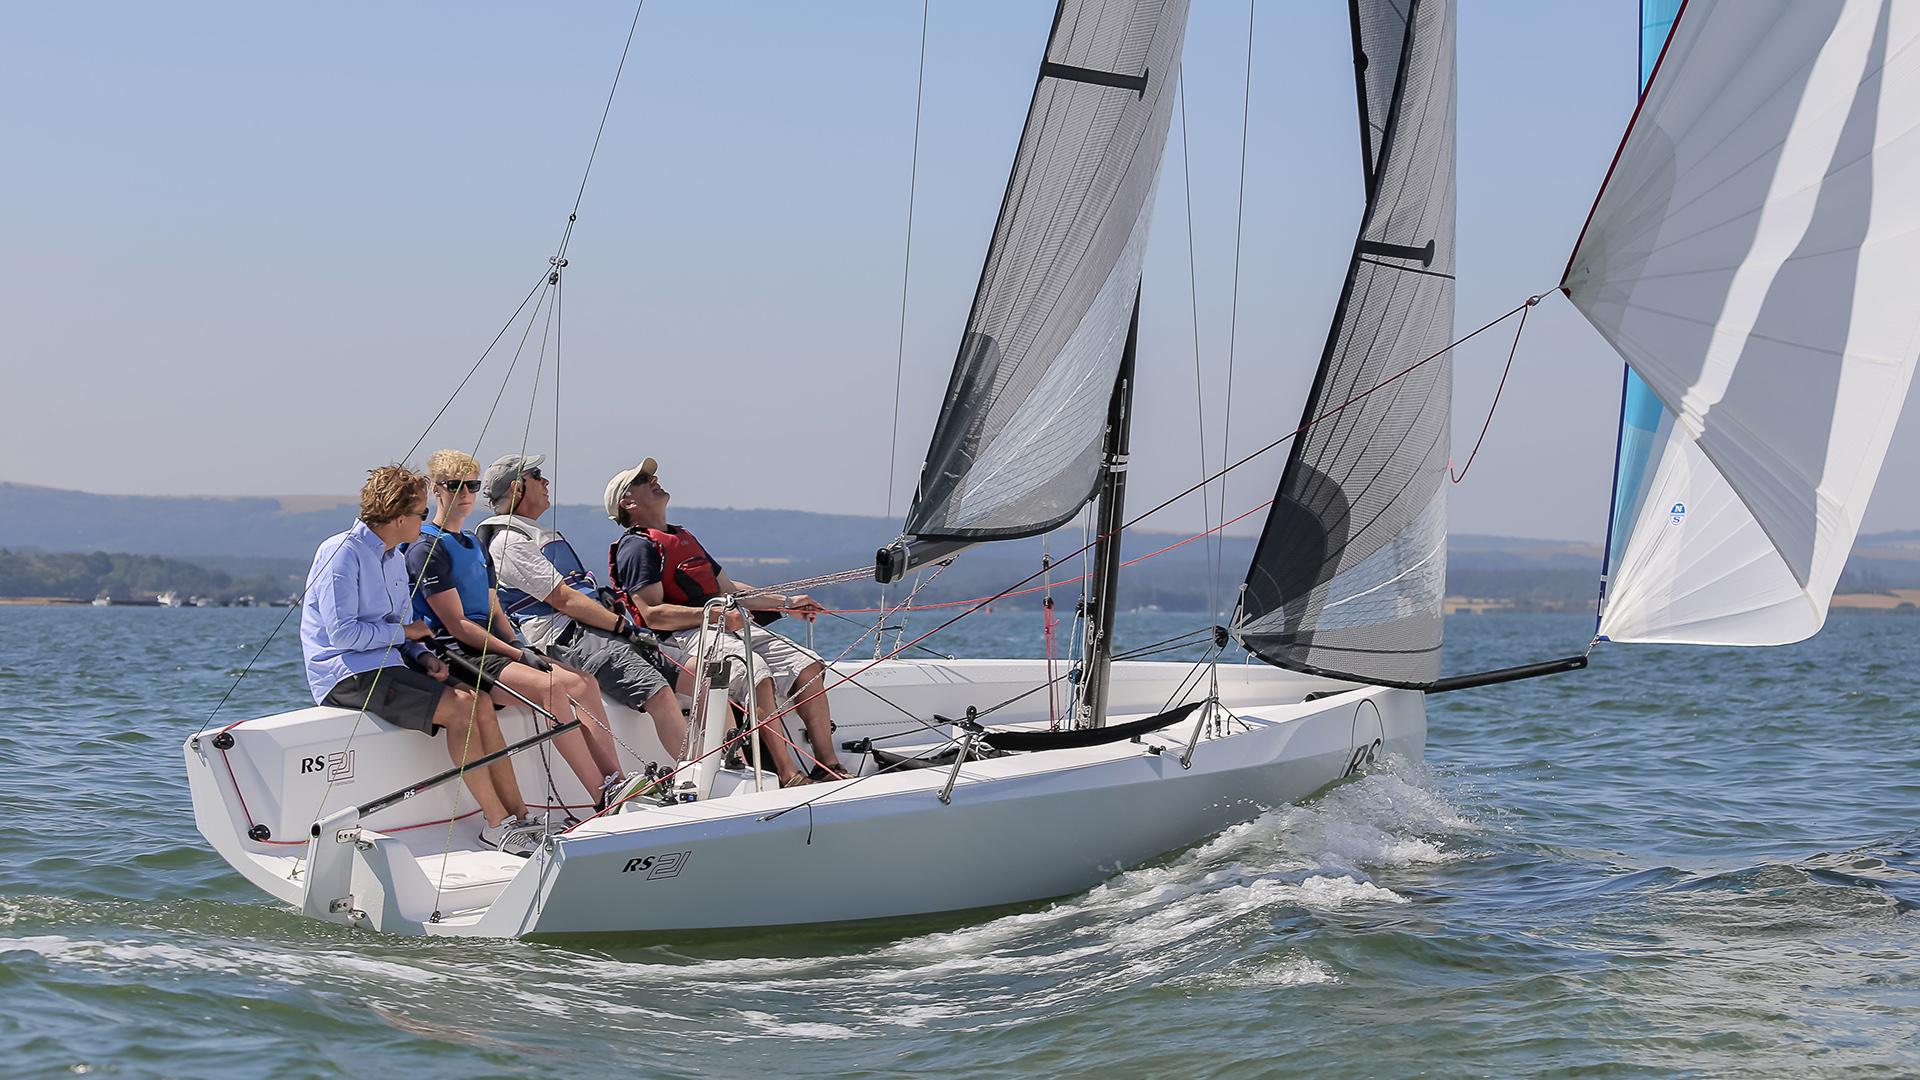 RS 21 Central Coast Sailing 10.jpg